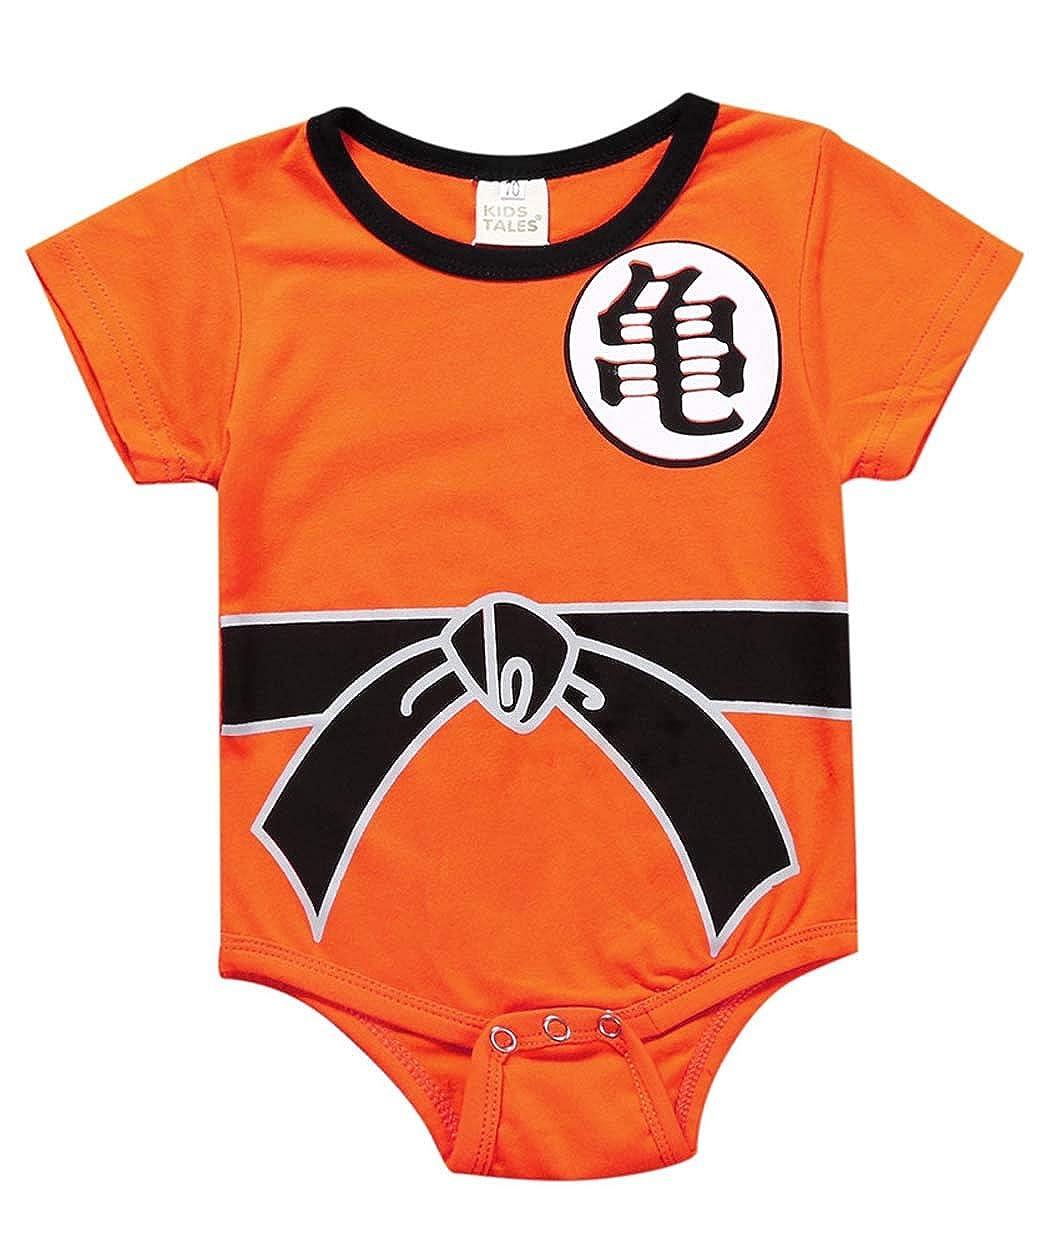 Askong Baby Jungen Halloween Cosplay Dragon Ball Z Son Goku Kurzarm Strampler Kleidung f/ür 3 Monate 3 Jahre